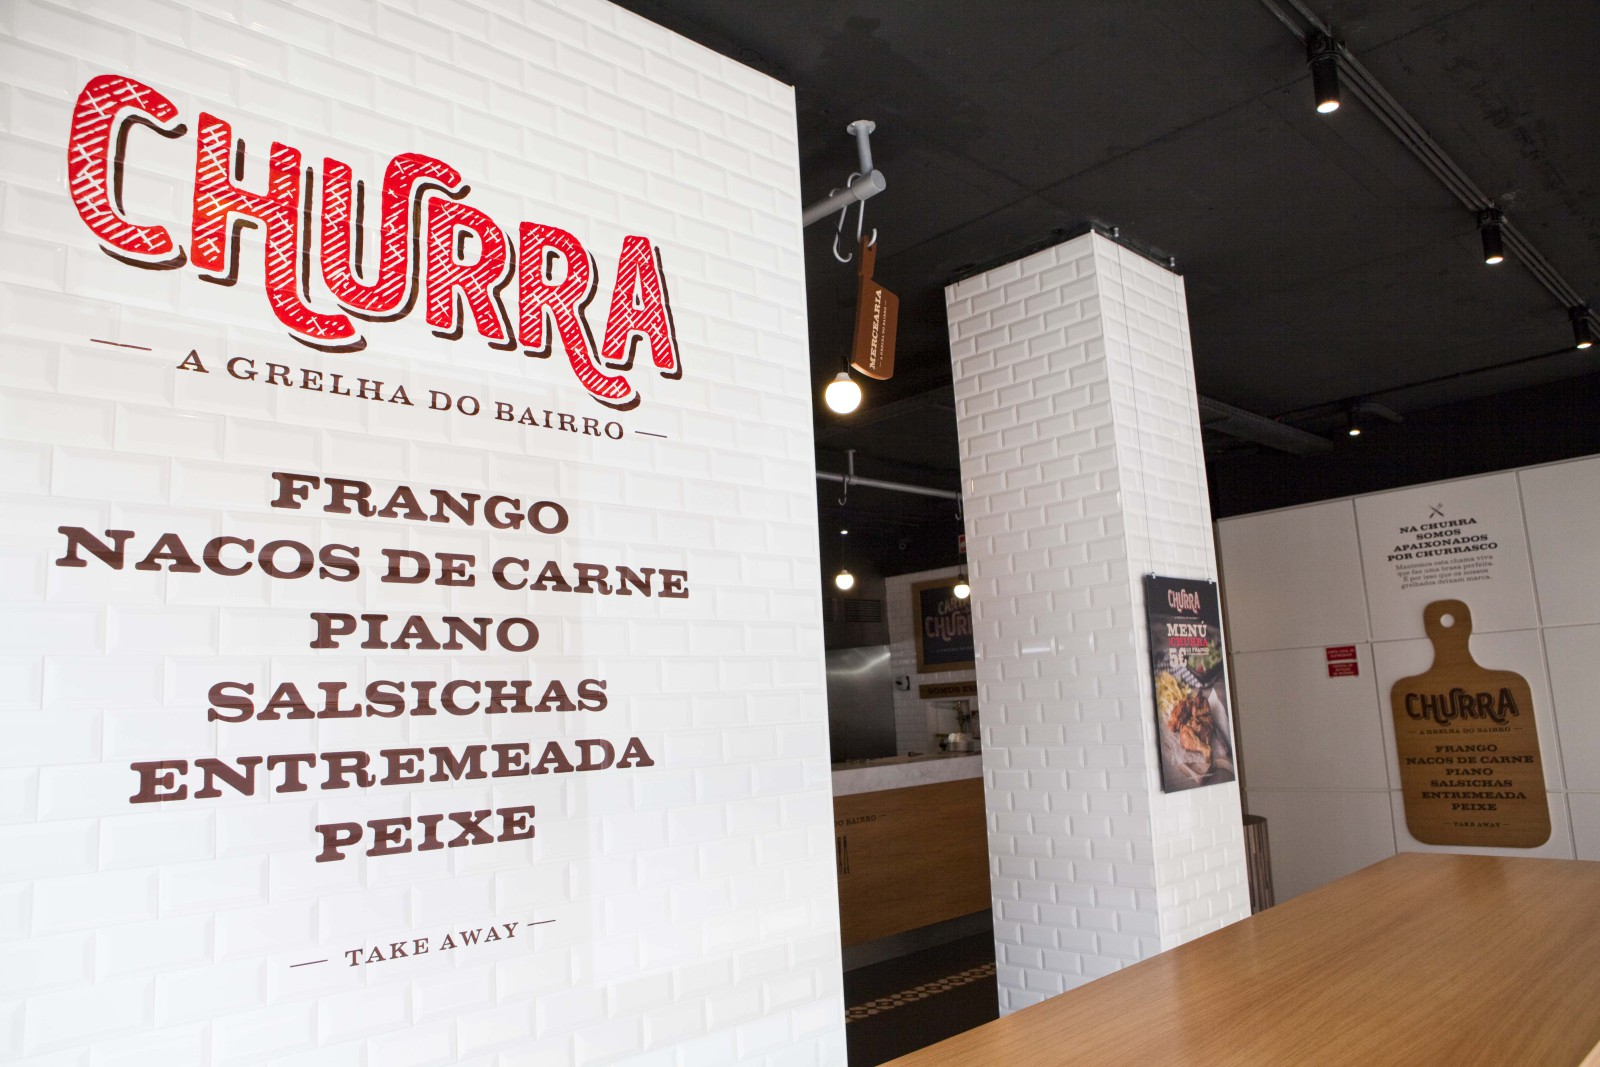 churra-a-grelha-do-bairro-resturant-poulet-grille-lisbonne